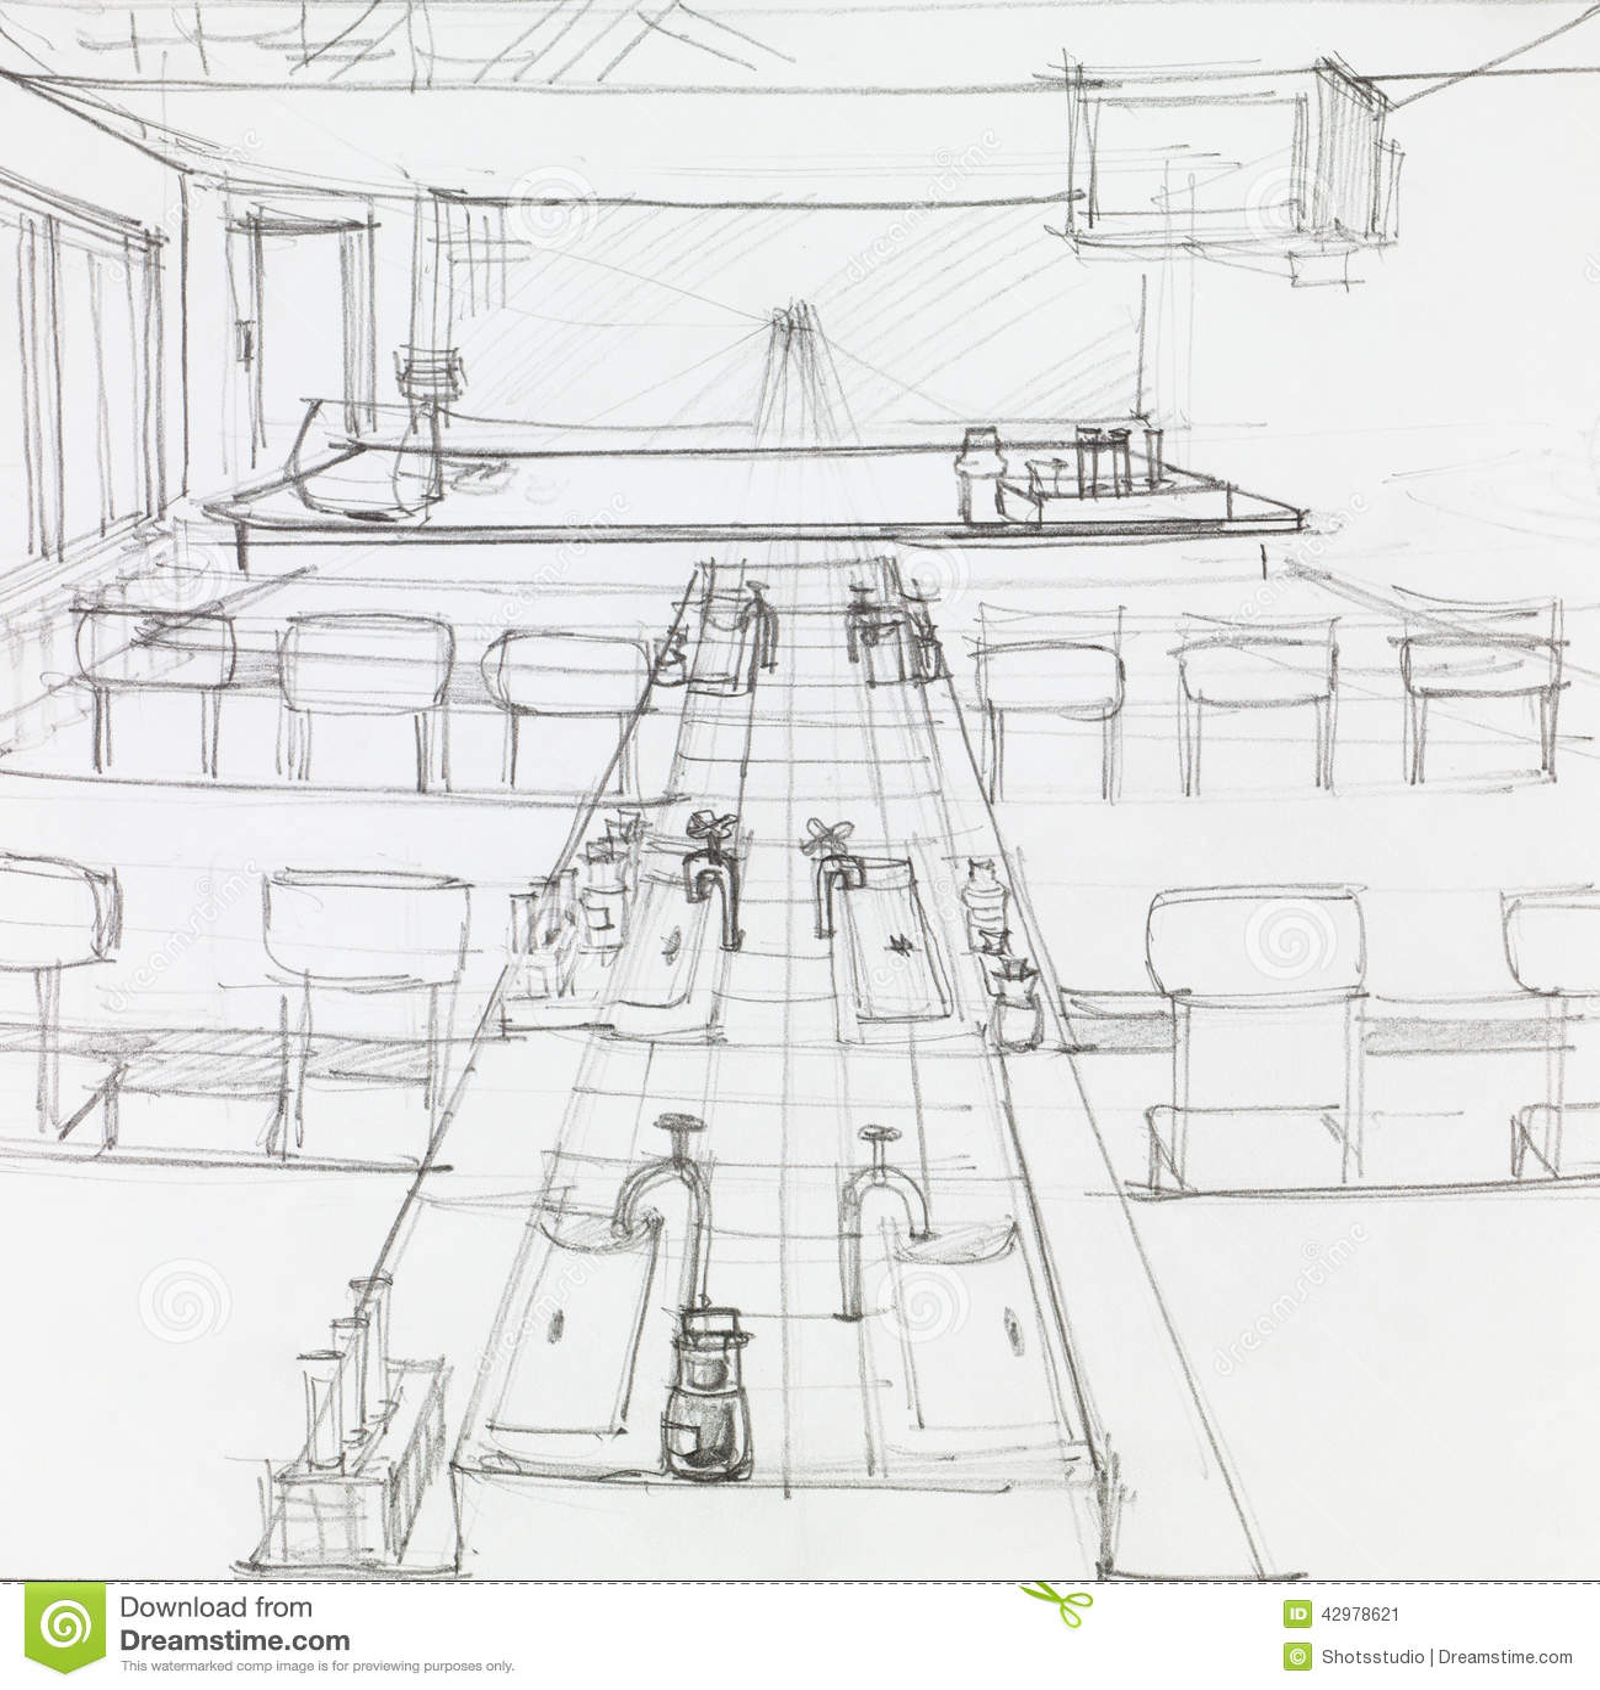 Empty School Science Laboratory Stock Illustration Image  : empty school science laboratory architectural perspective lab drawn hand 42978621 from www.dreamstime.com size 1300 x 1390 jpeg 182kB